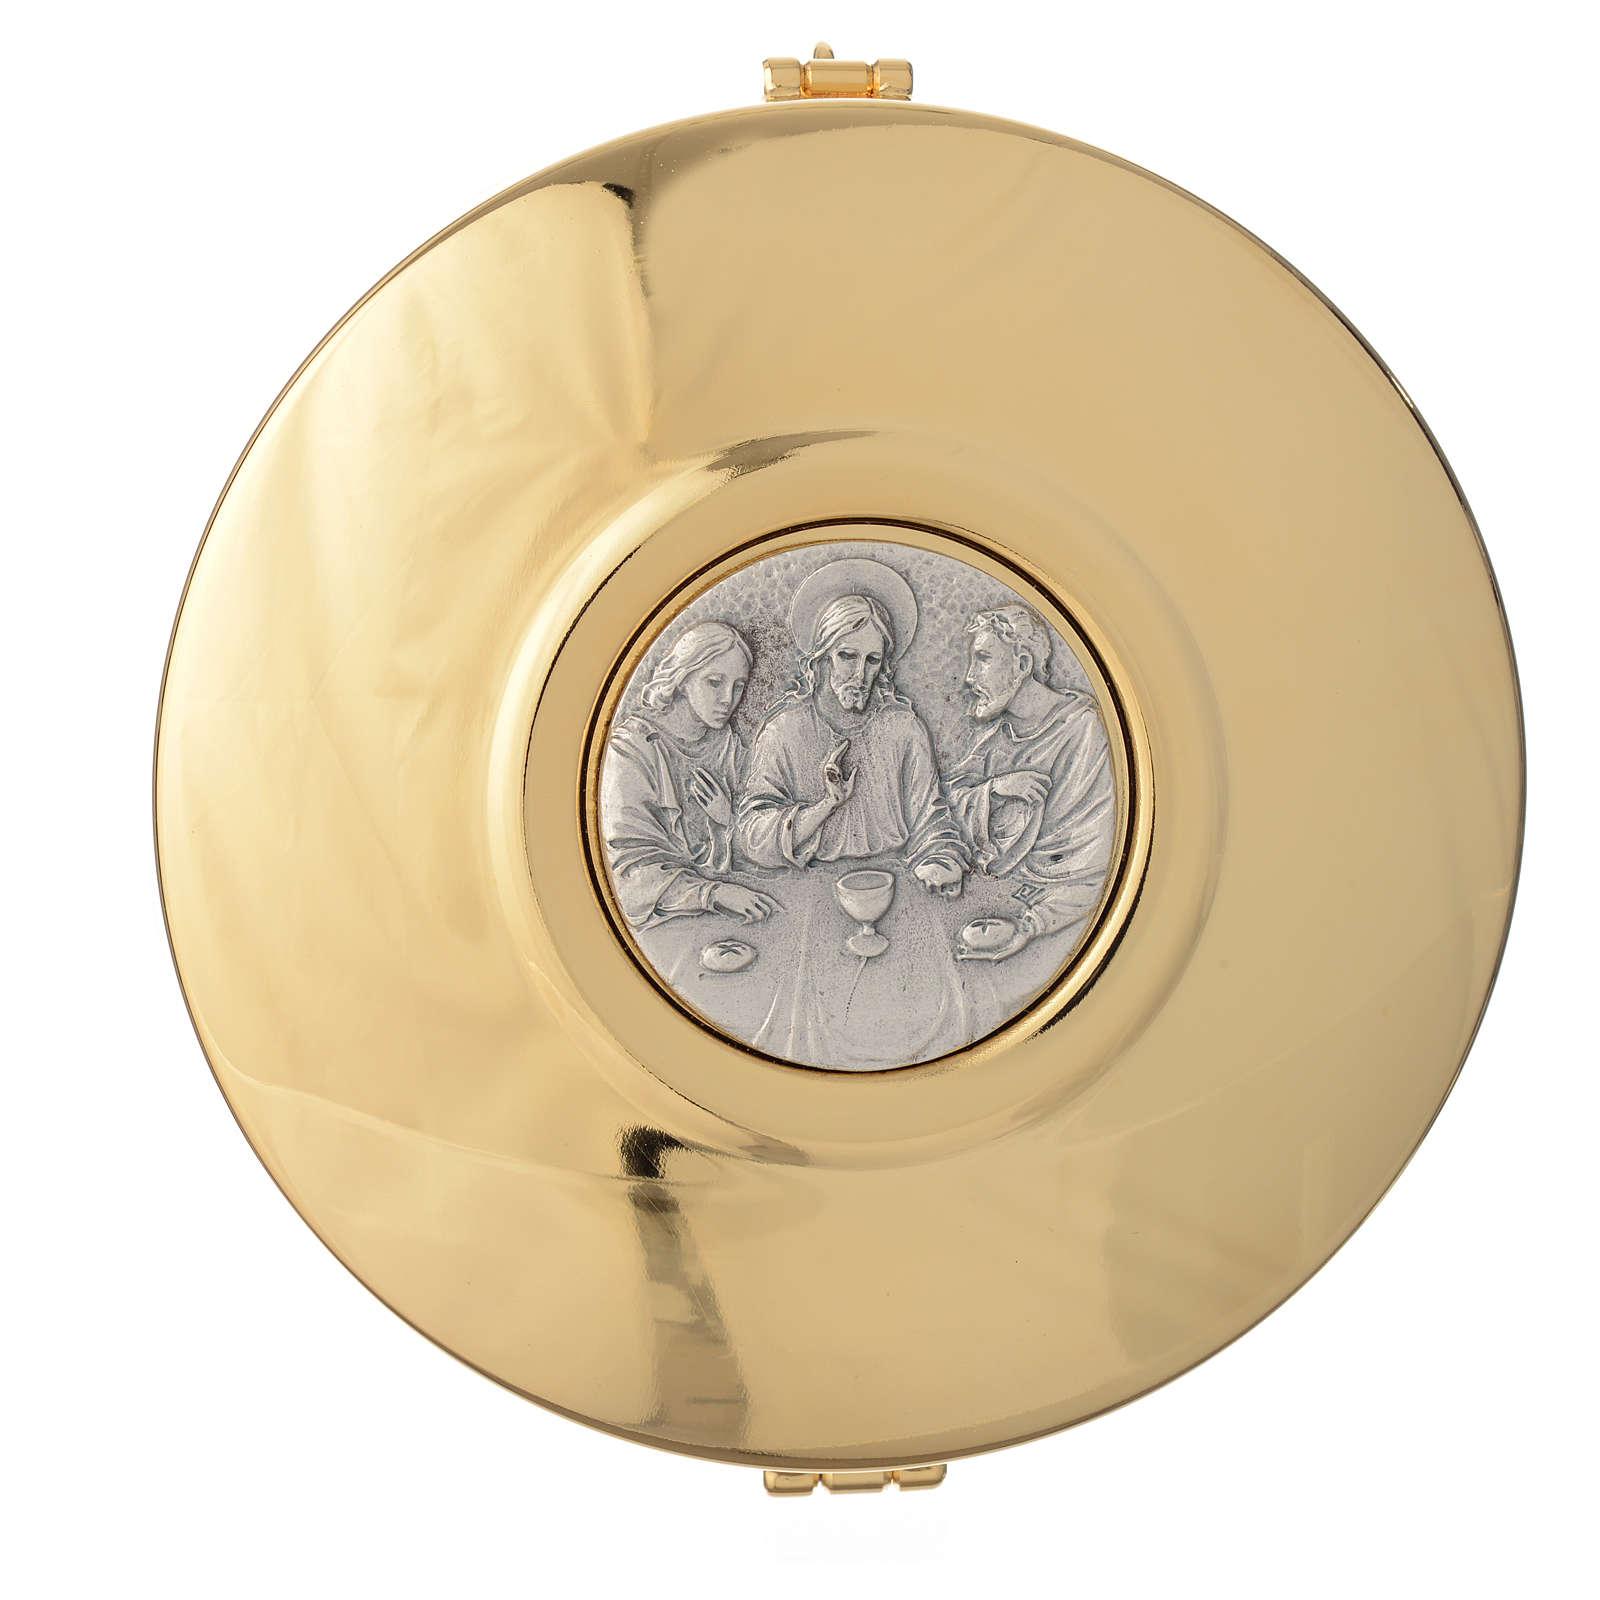 Custode laiton médaille étain Cène 11 cm diam 3